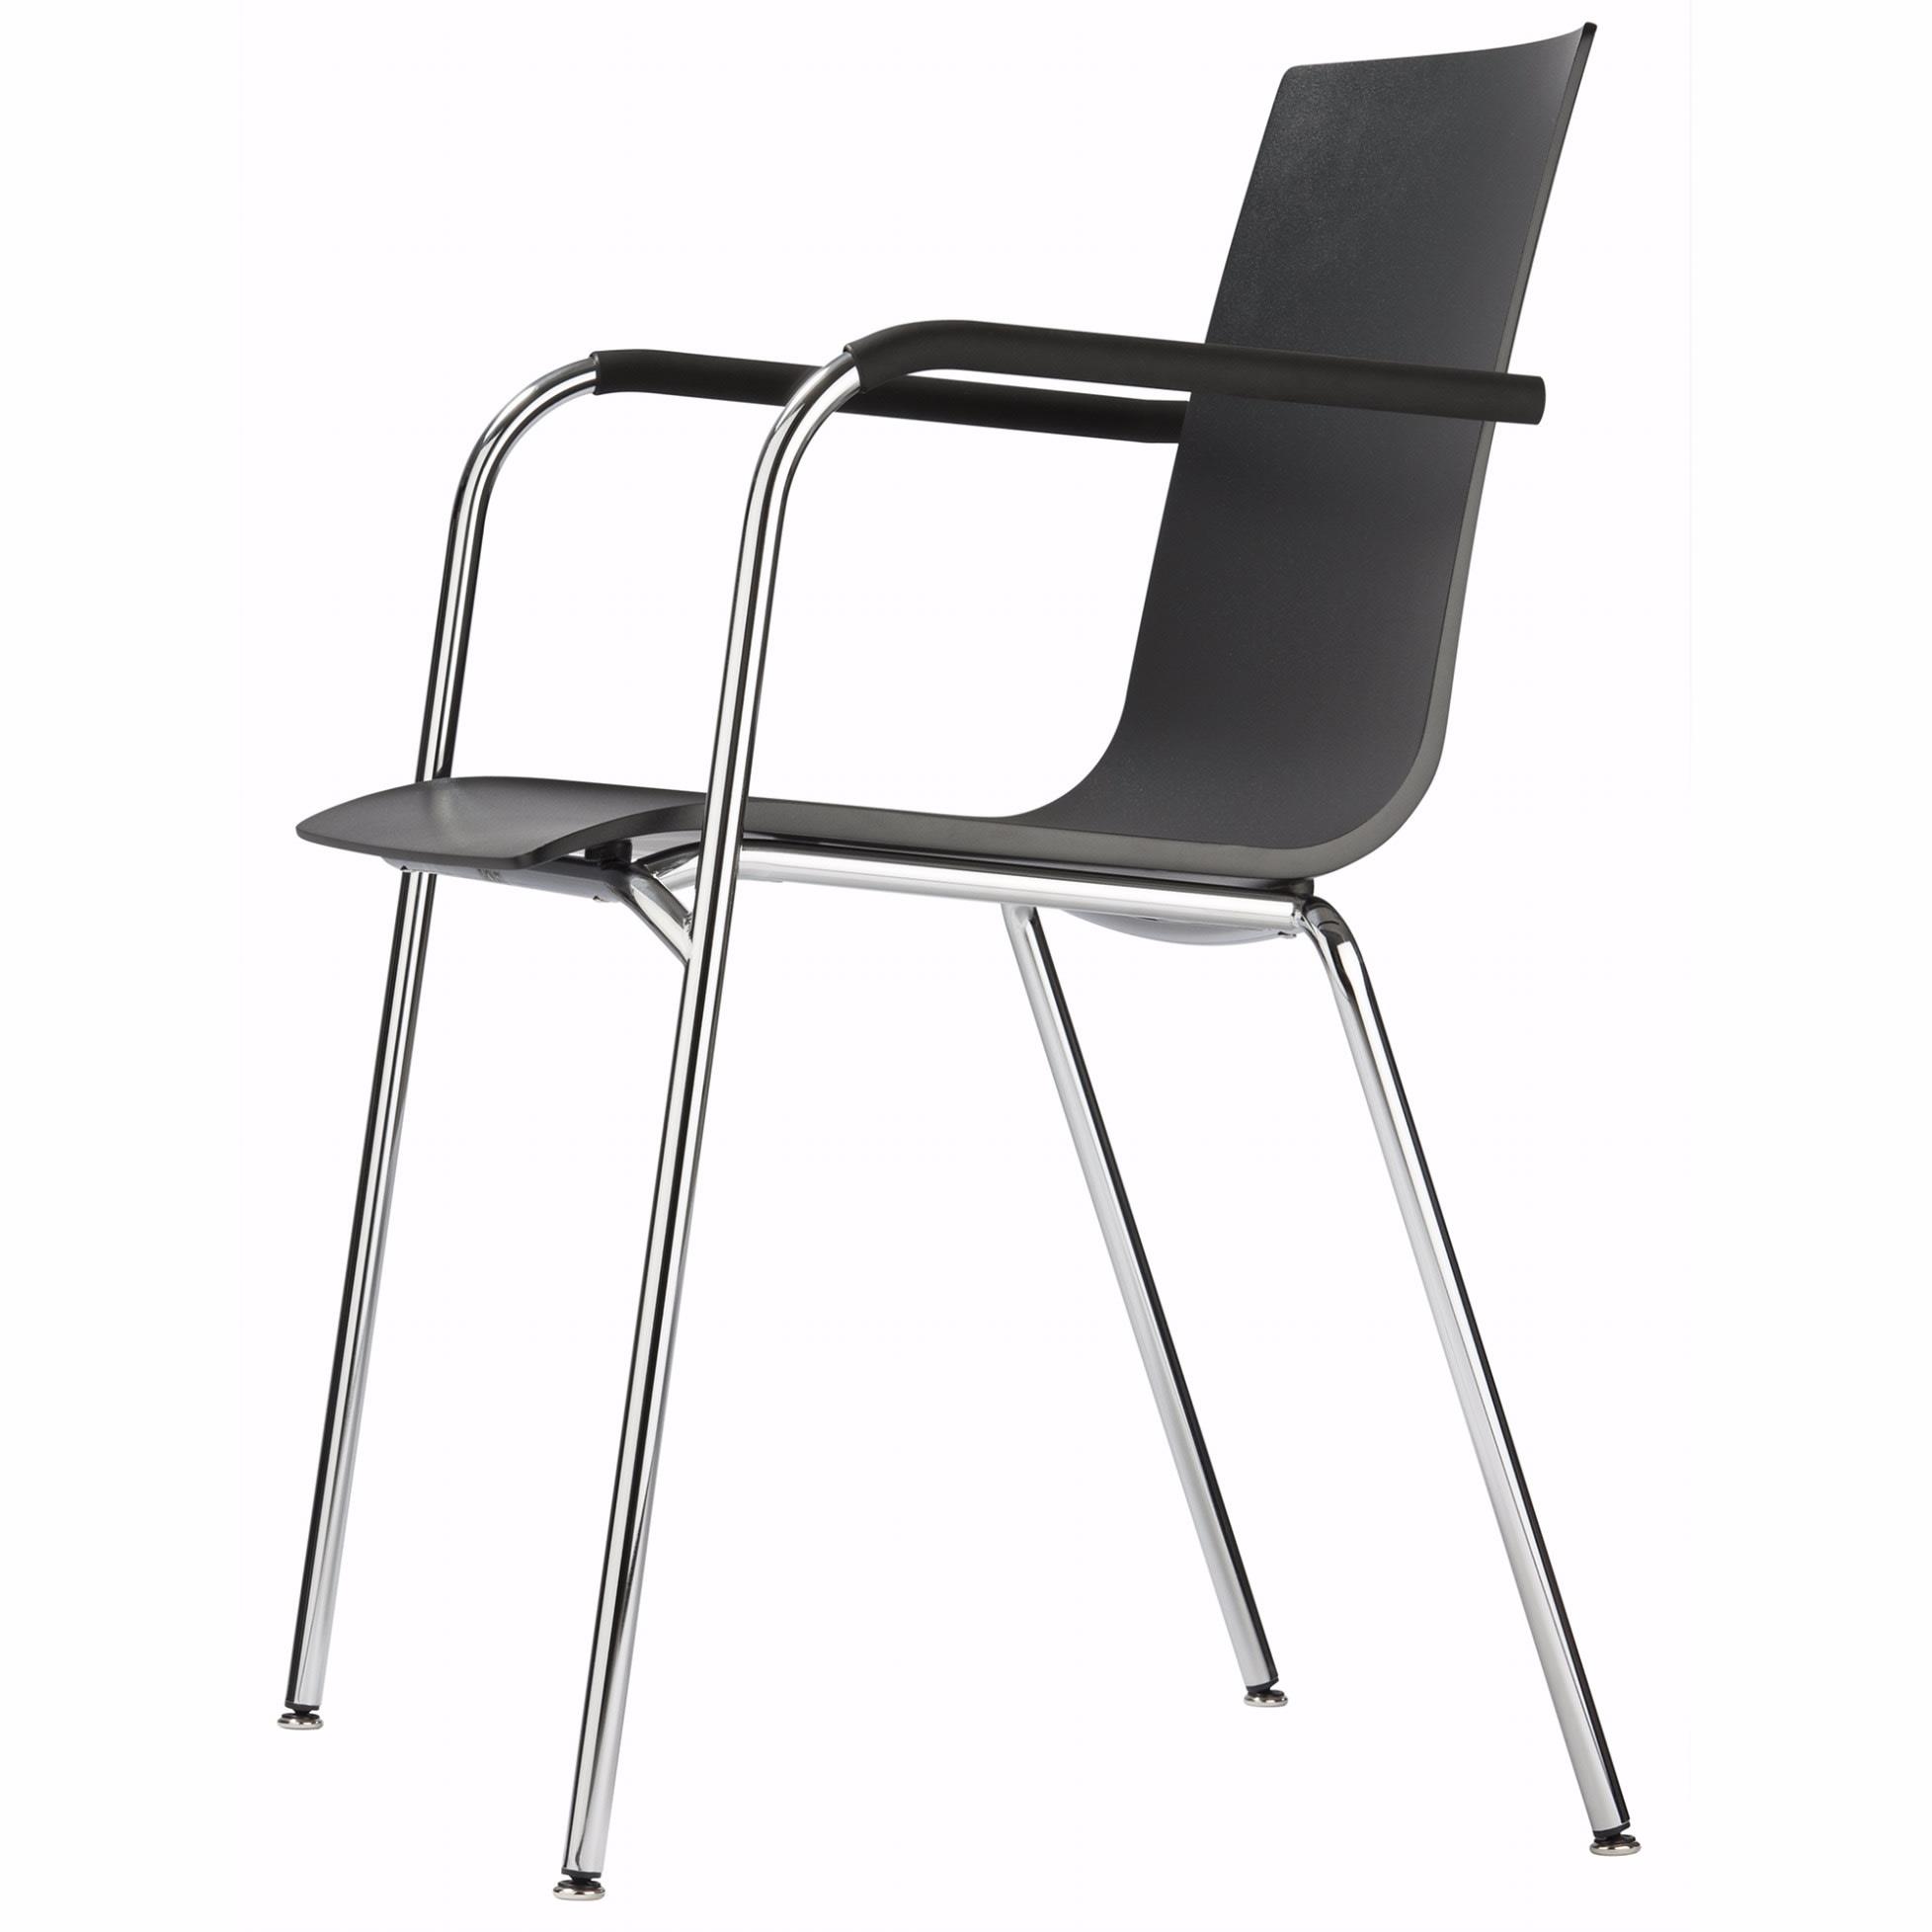 stuhl s 160 f von thonet. Black Bedroom Furniture Sets. Home Design Ideas